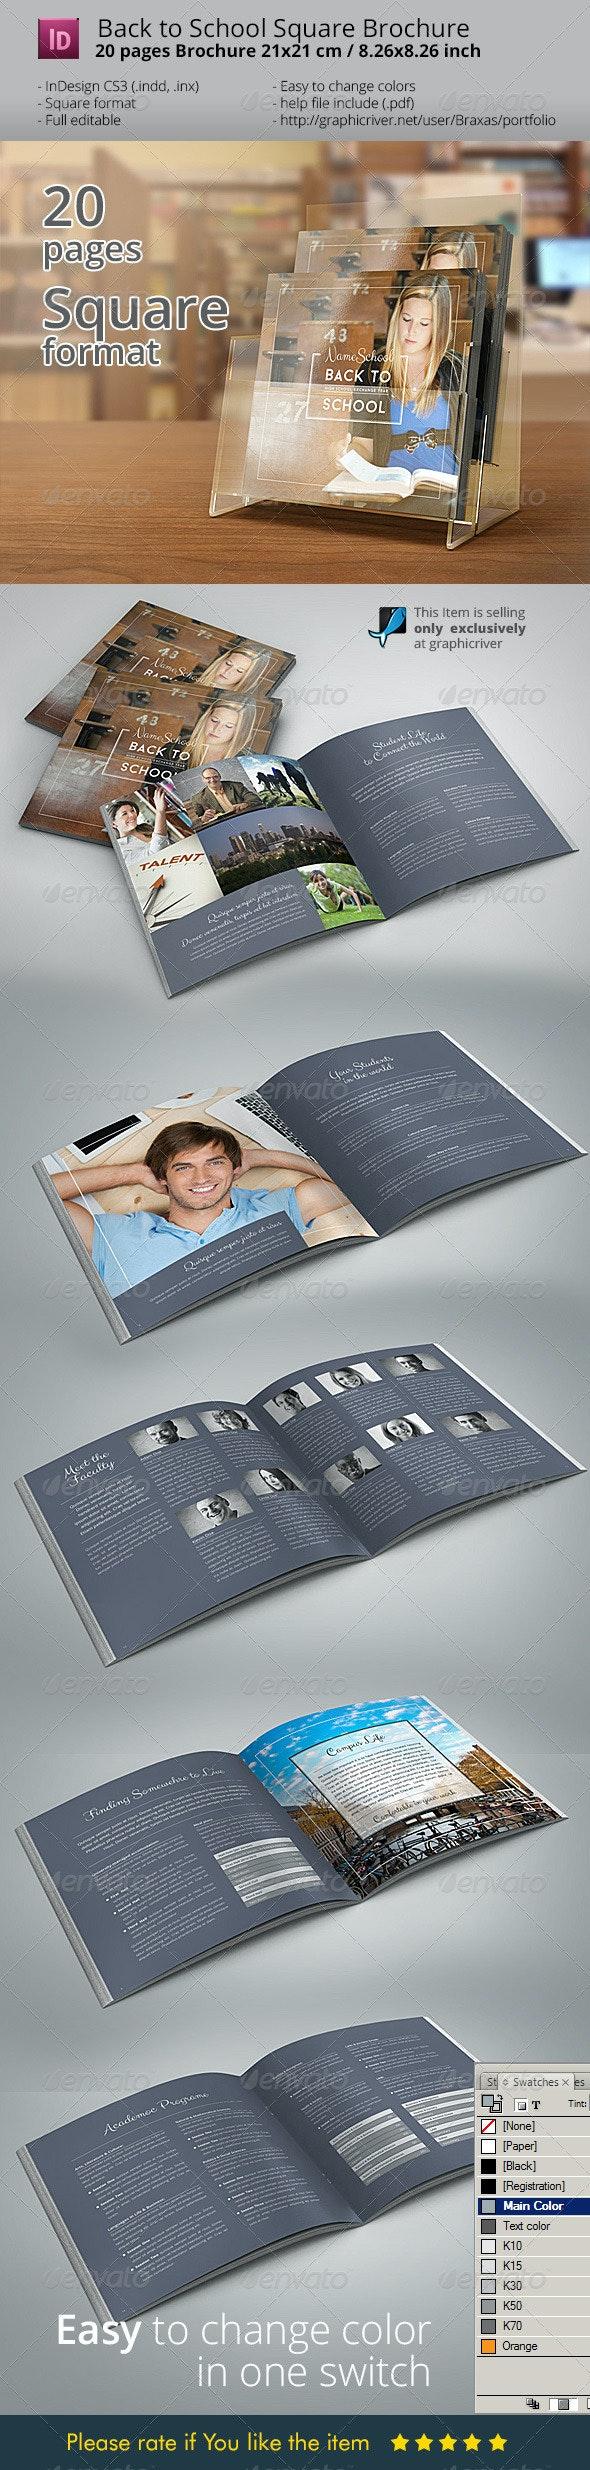 Back To School Square Brochure - Informational Brochures